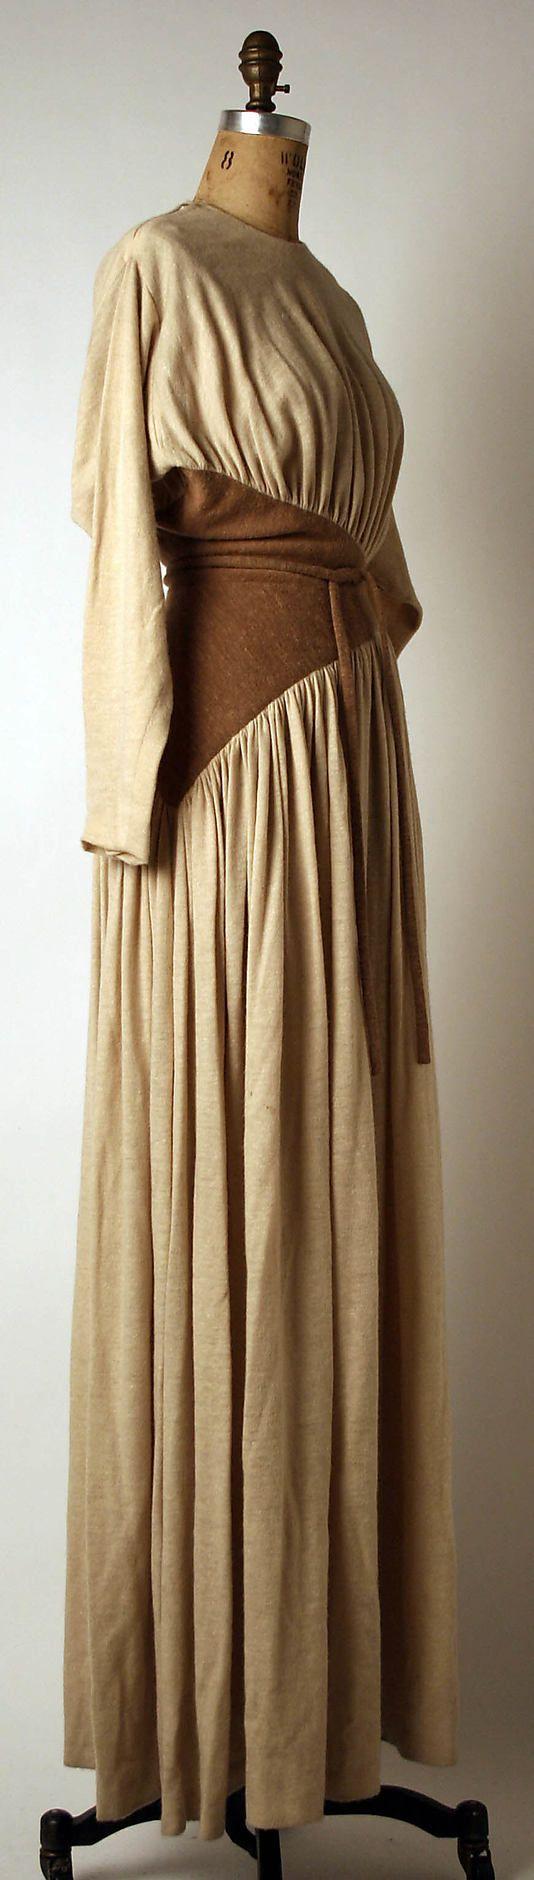 Evening dress Madame Grès (Alix Barton) (French, Paris 1903–1993 Var region) Date: ca. 1975 Culture: French Medium: wool